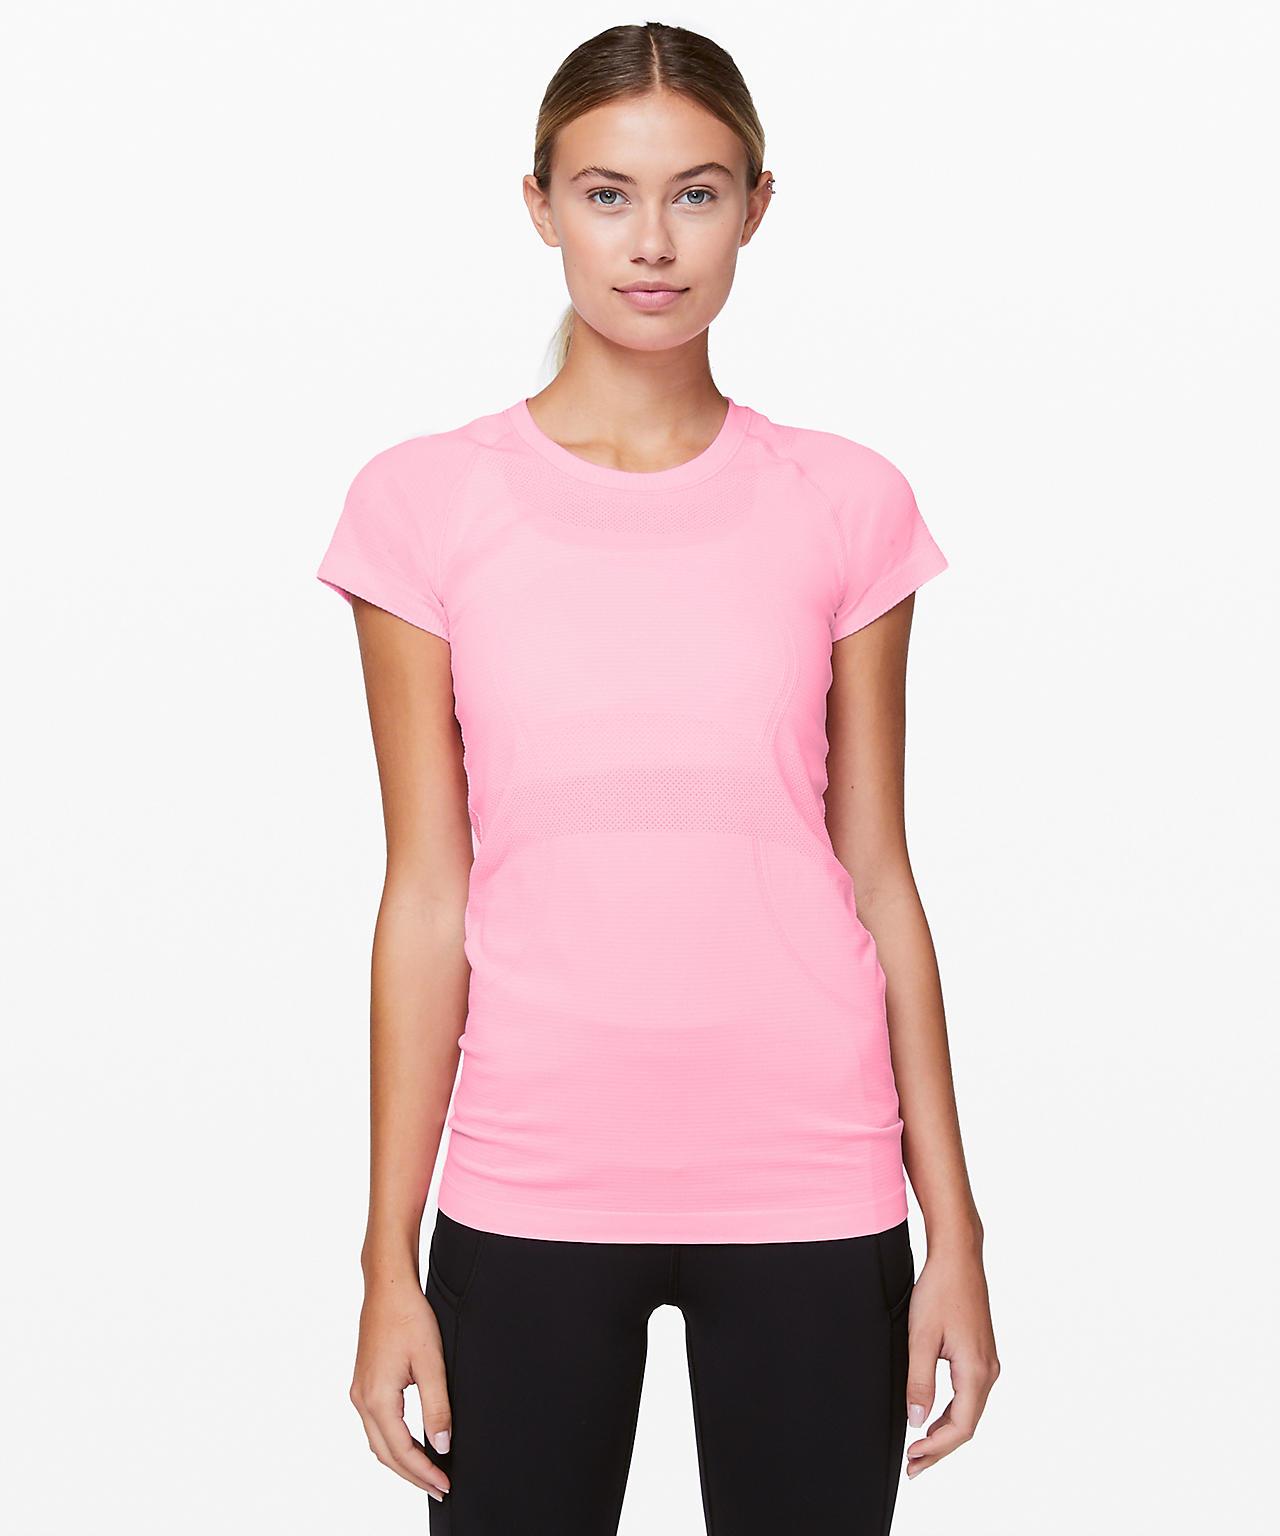 Swiftly Tech Short Sleeve Pink Shell